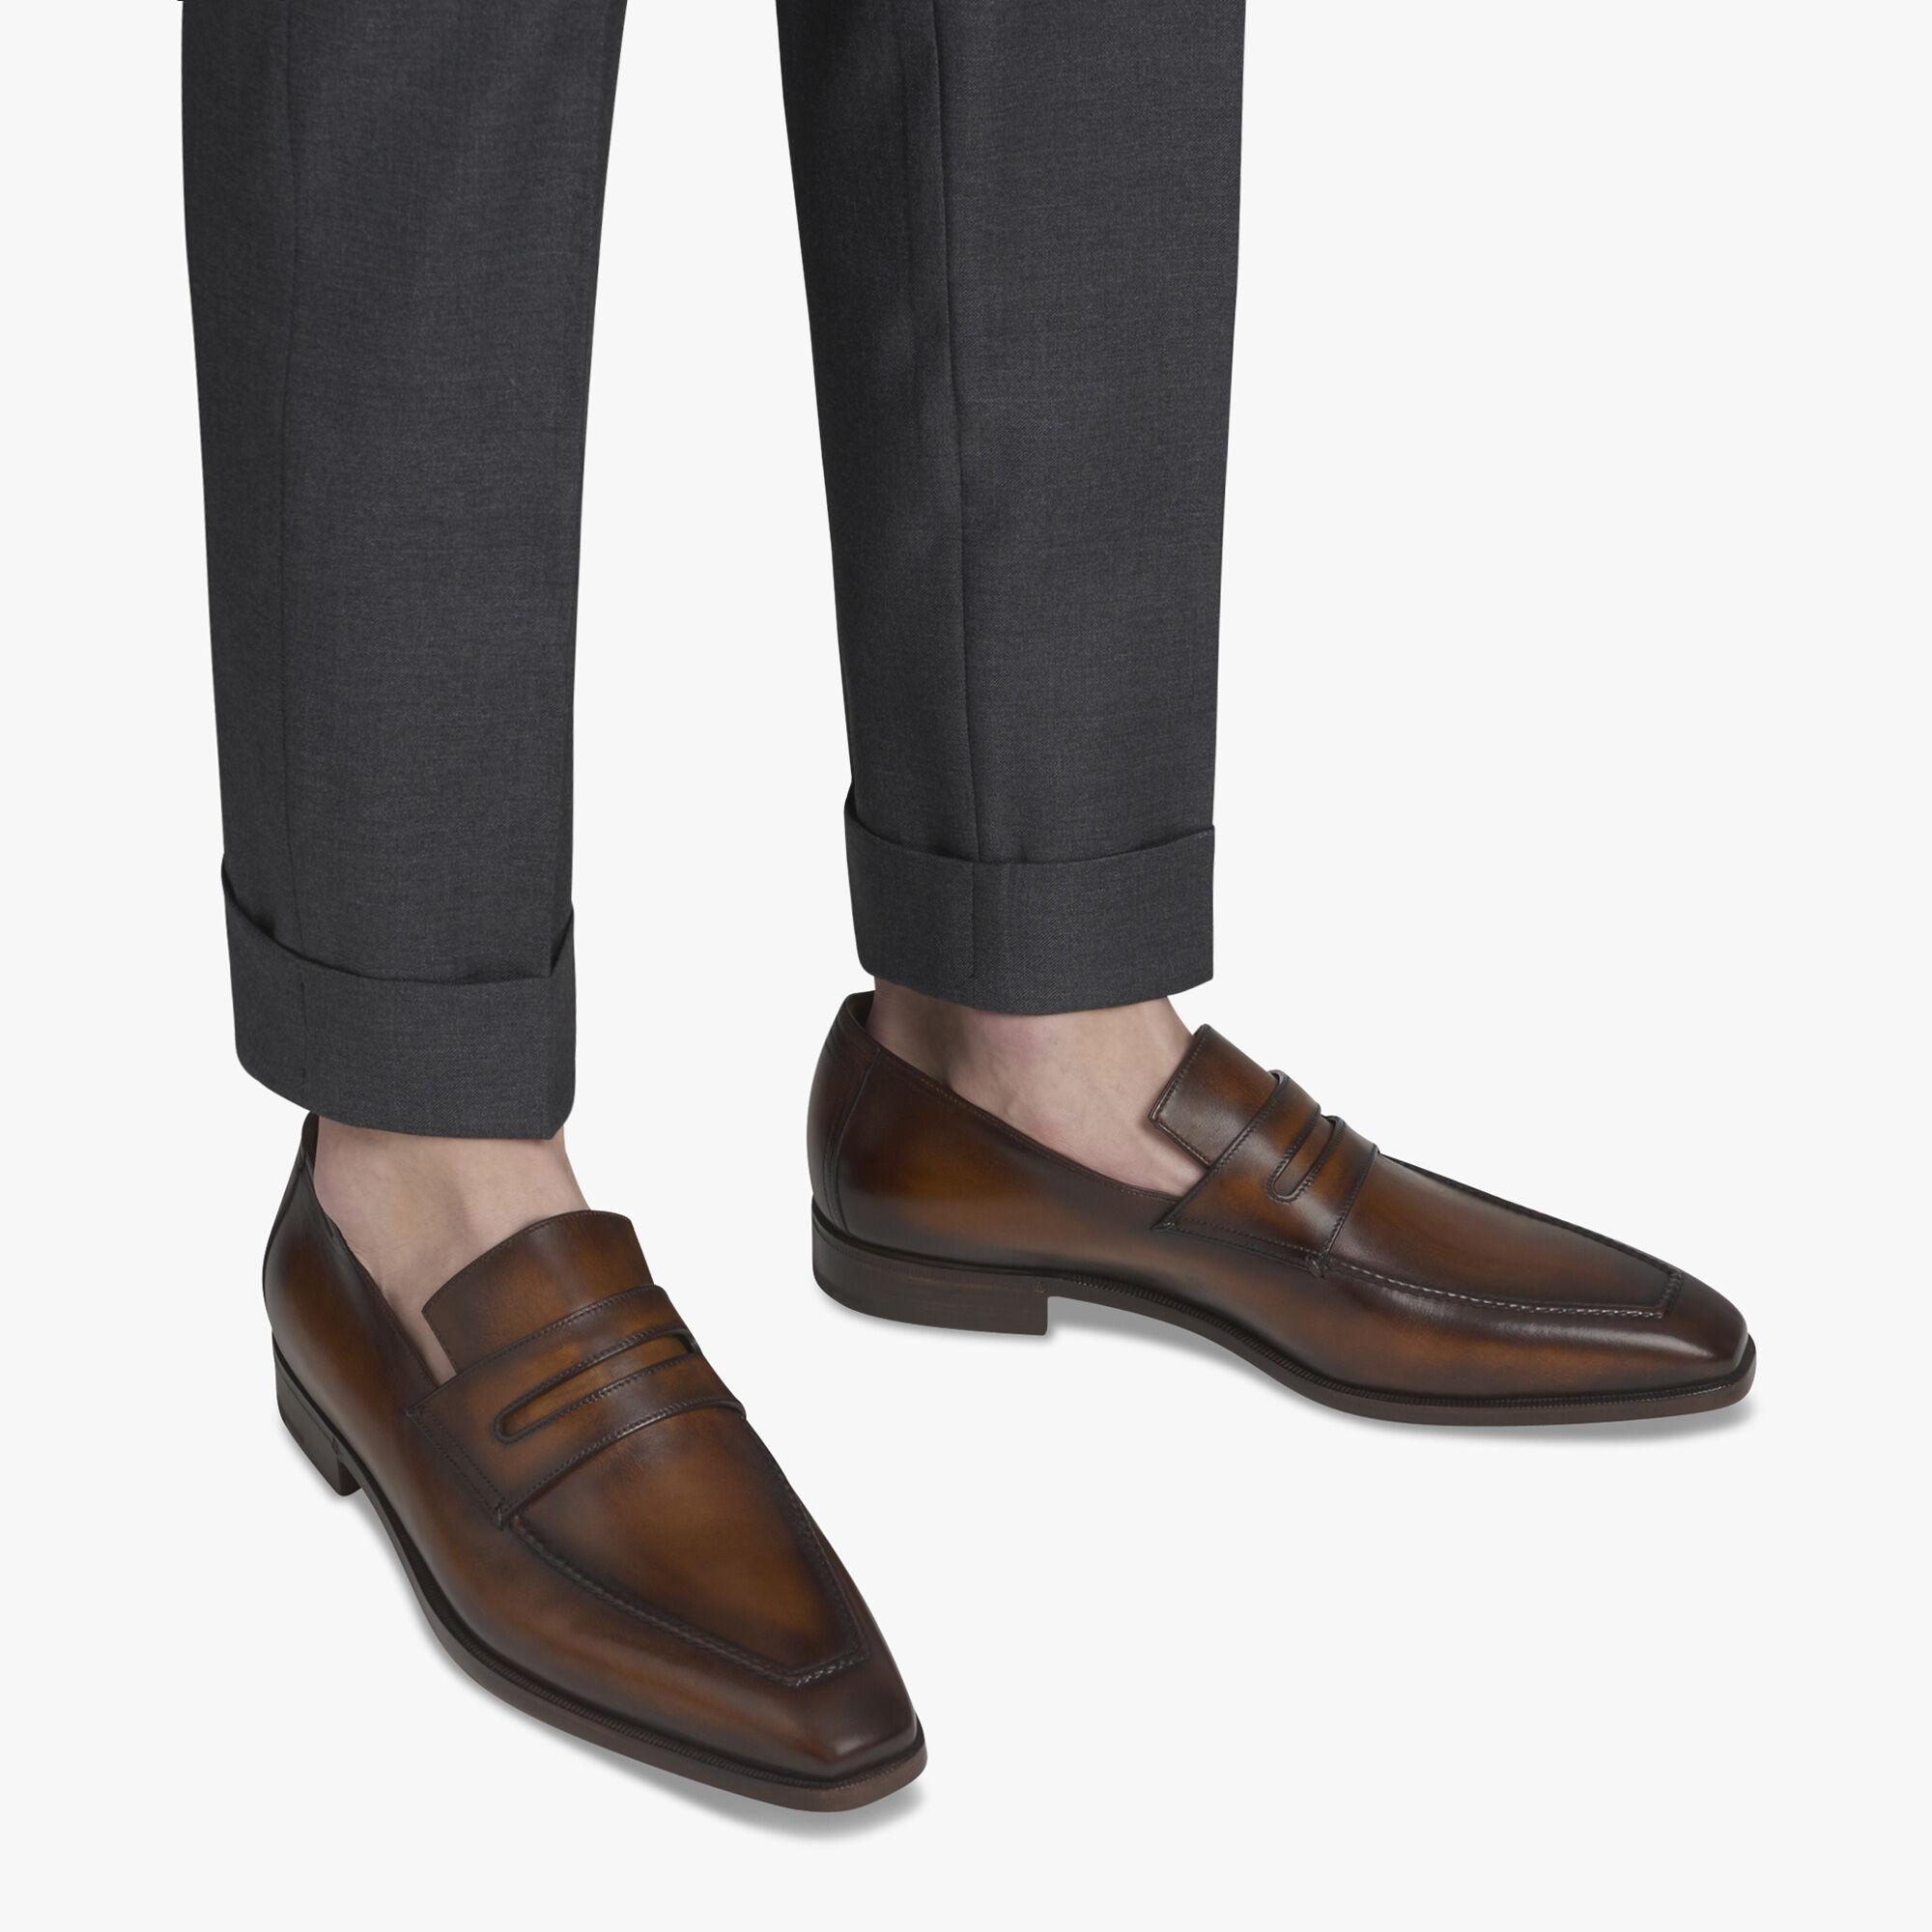 Demesure Loafer Demesure Berluti Leather Leather Andy Loafer